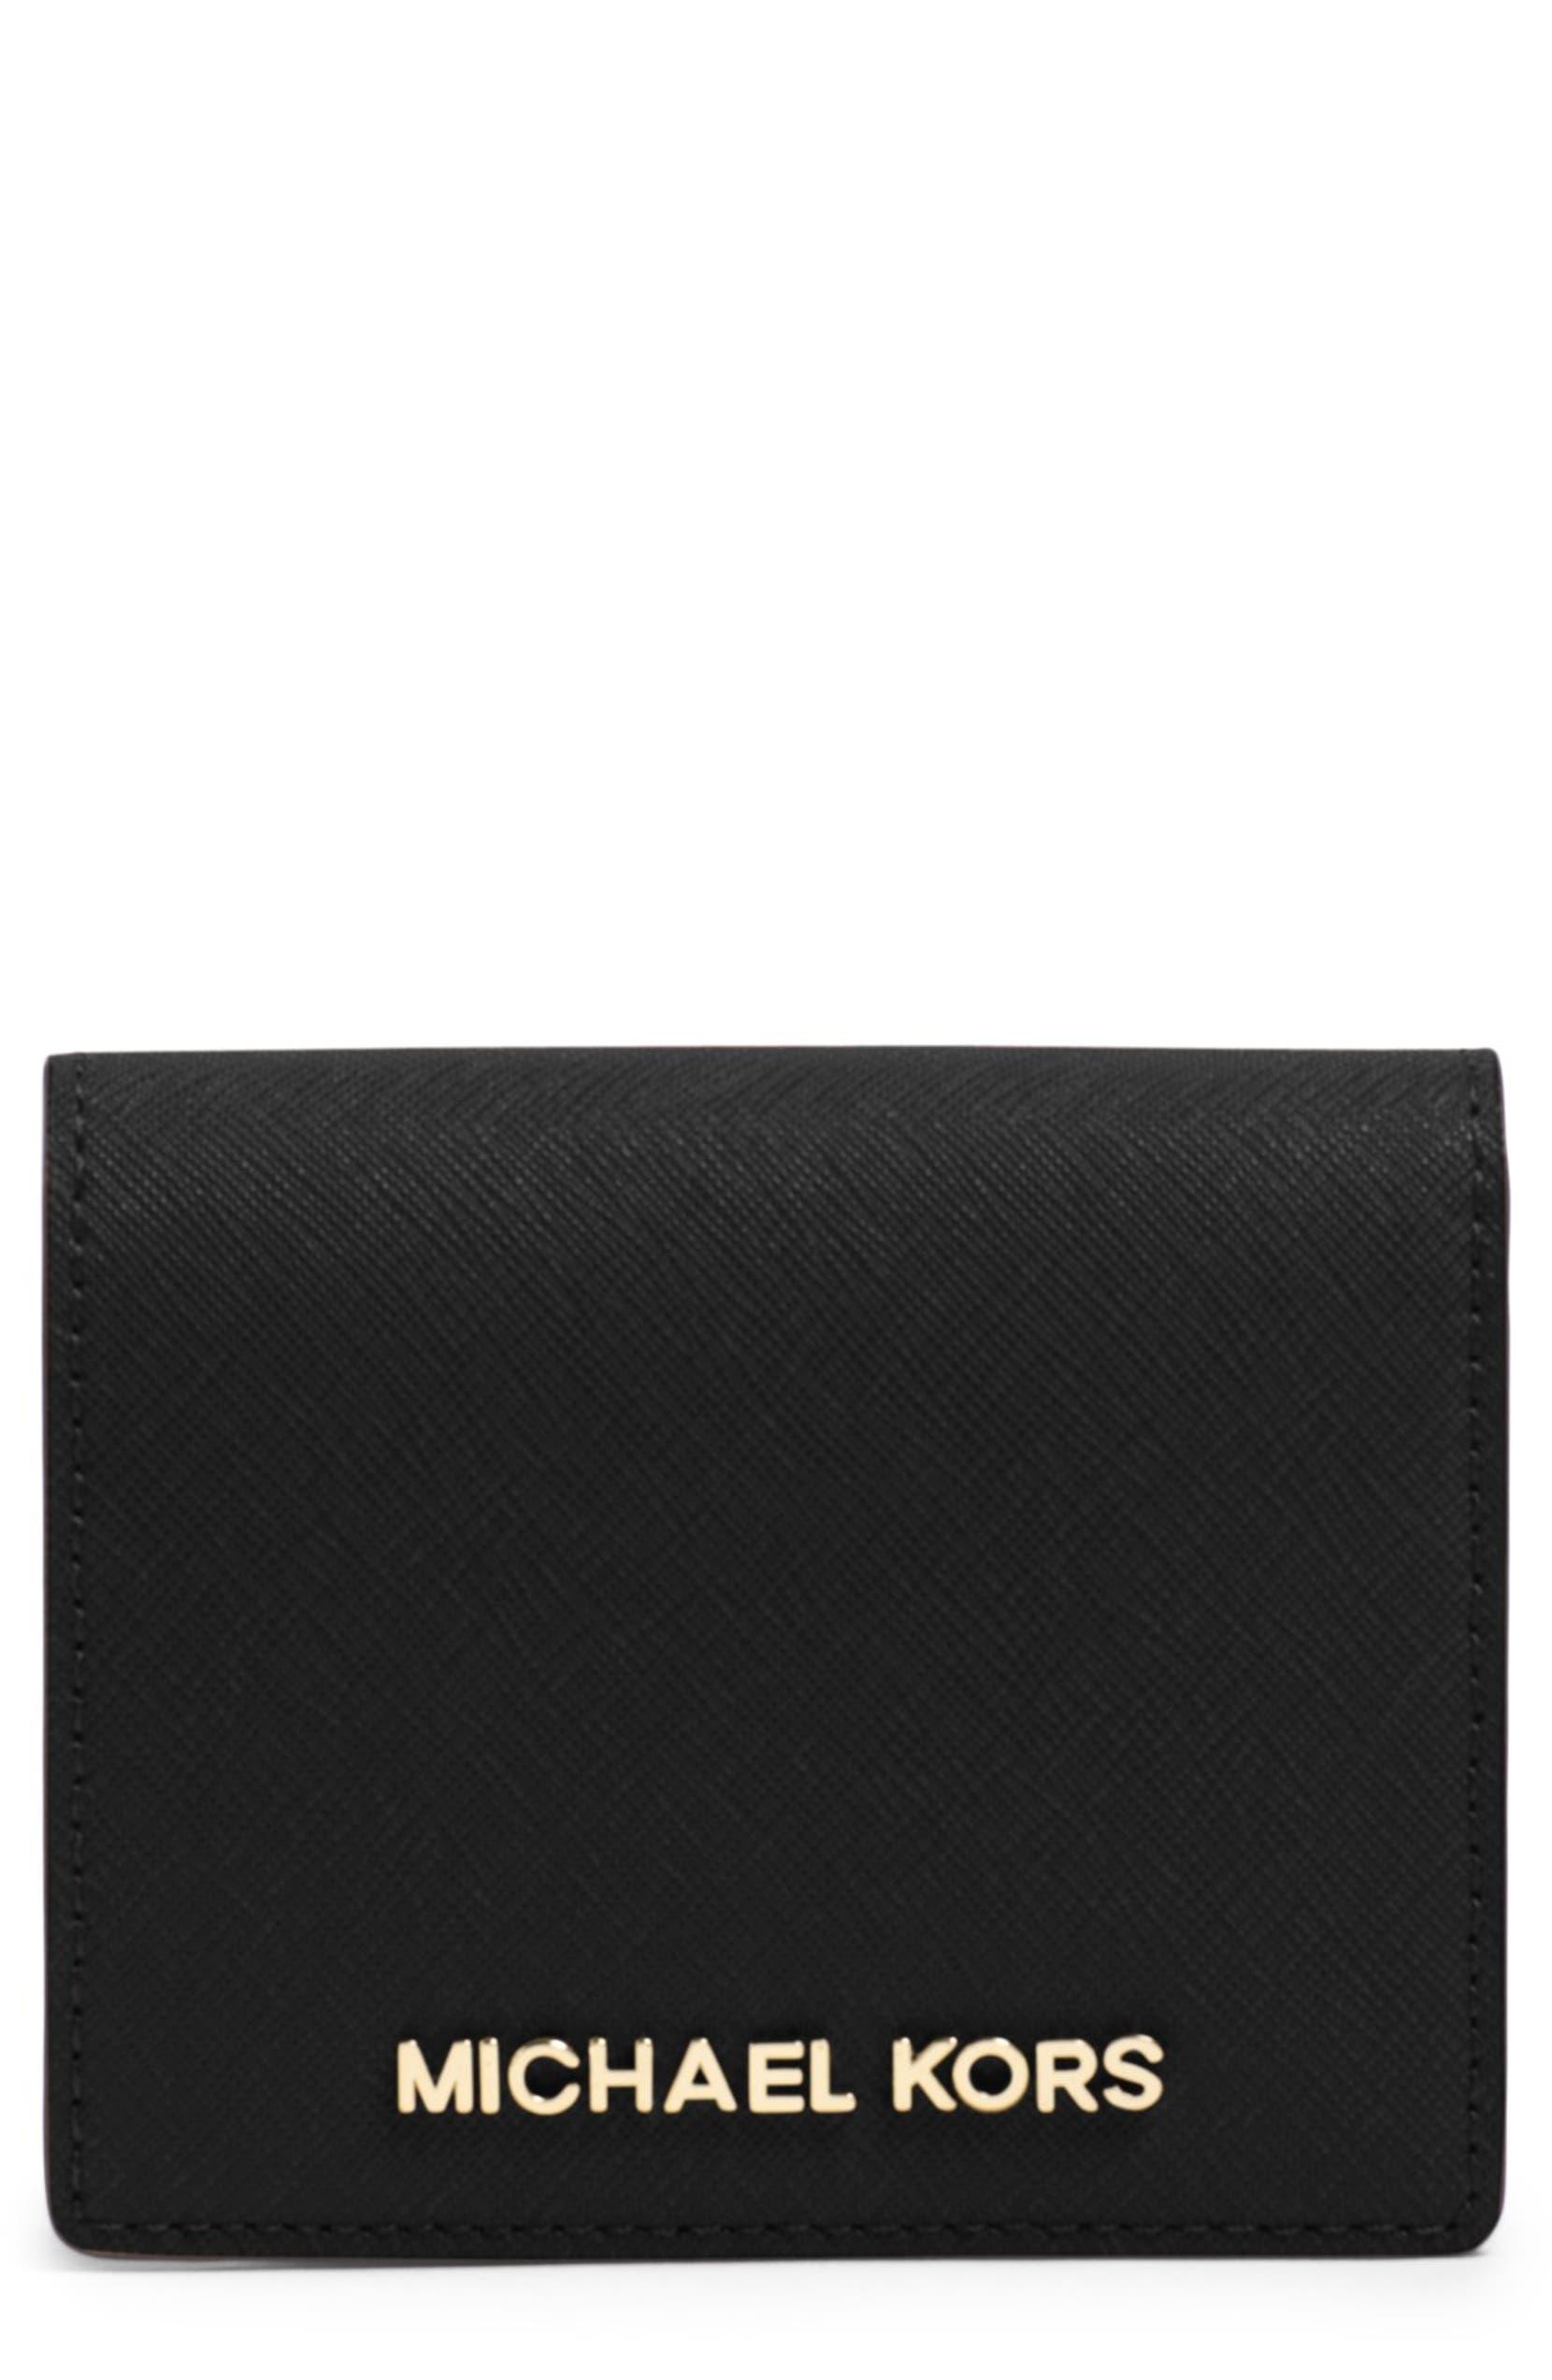 0e3781a4f425 MICHAEL Michael Kors 'Jet Set' Saffiano Leather Wallet   Nordstrom